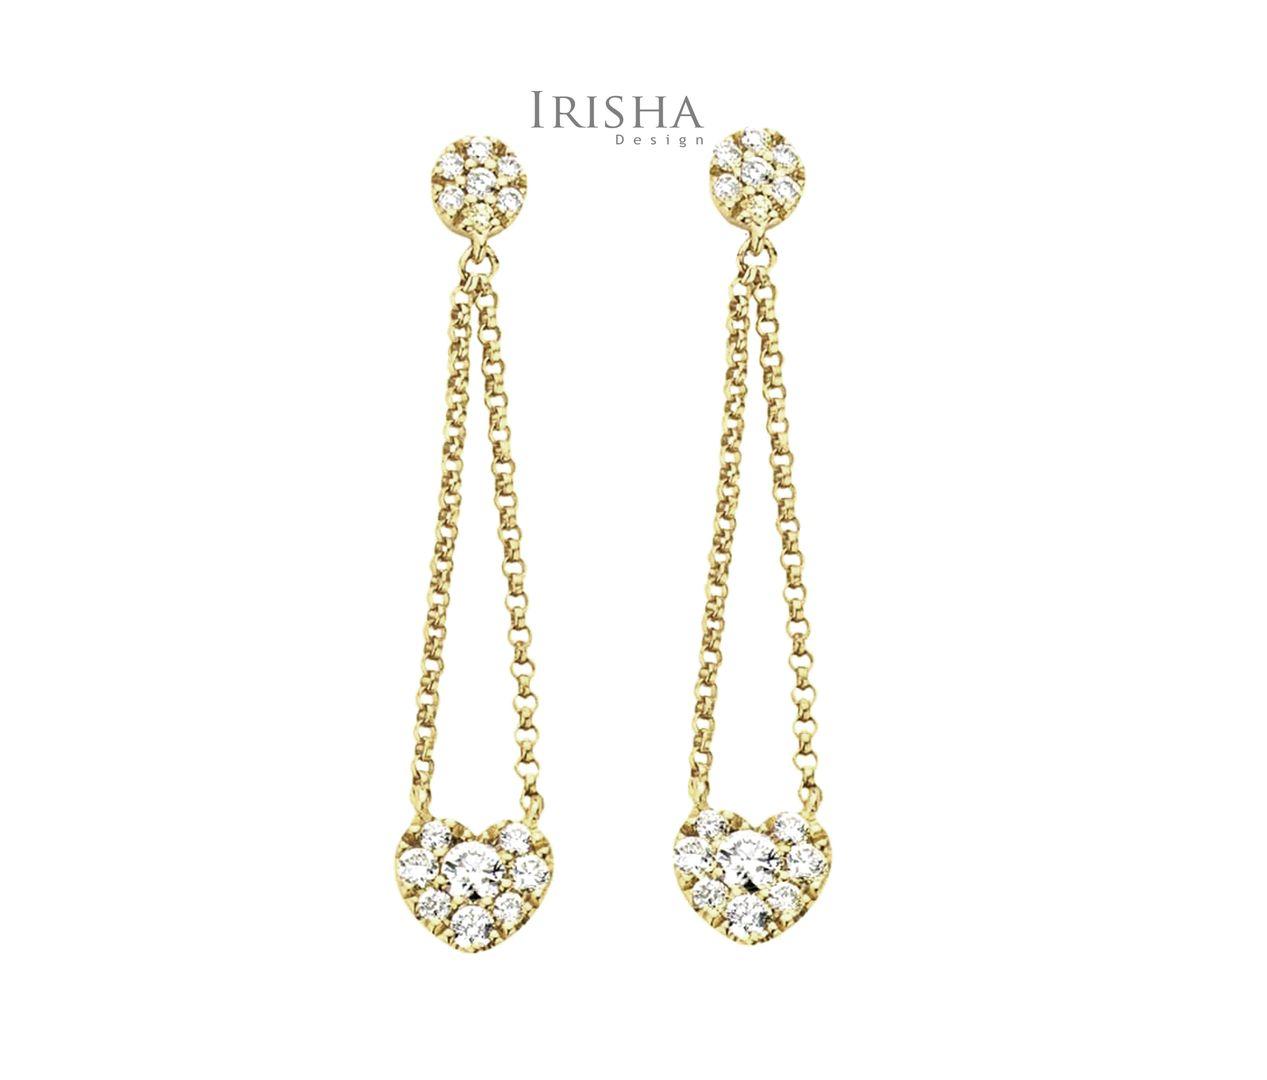 Genuine Pave Diamond Heart Drop Chain Earrings 14K Gold Christmas Gift Jewelry